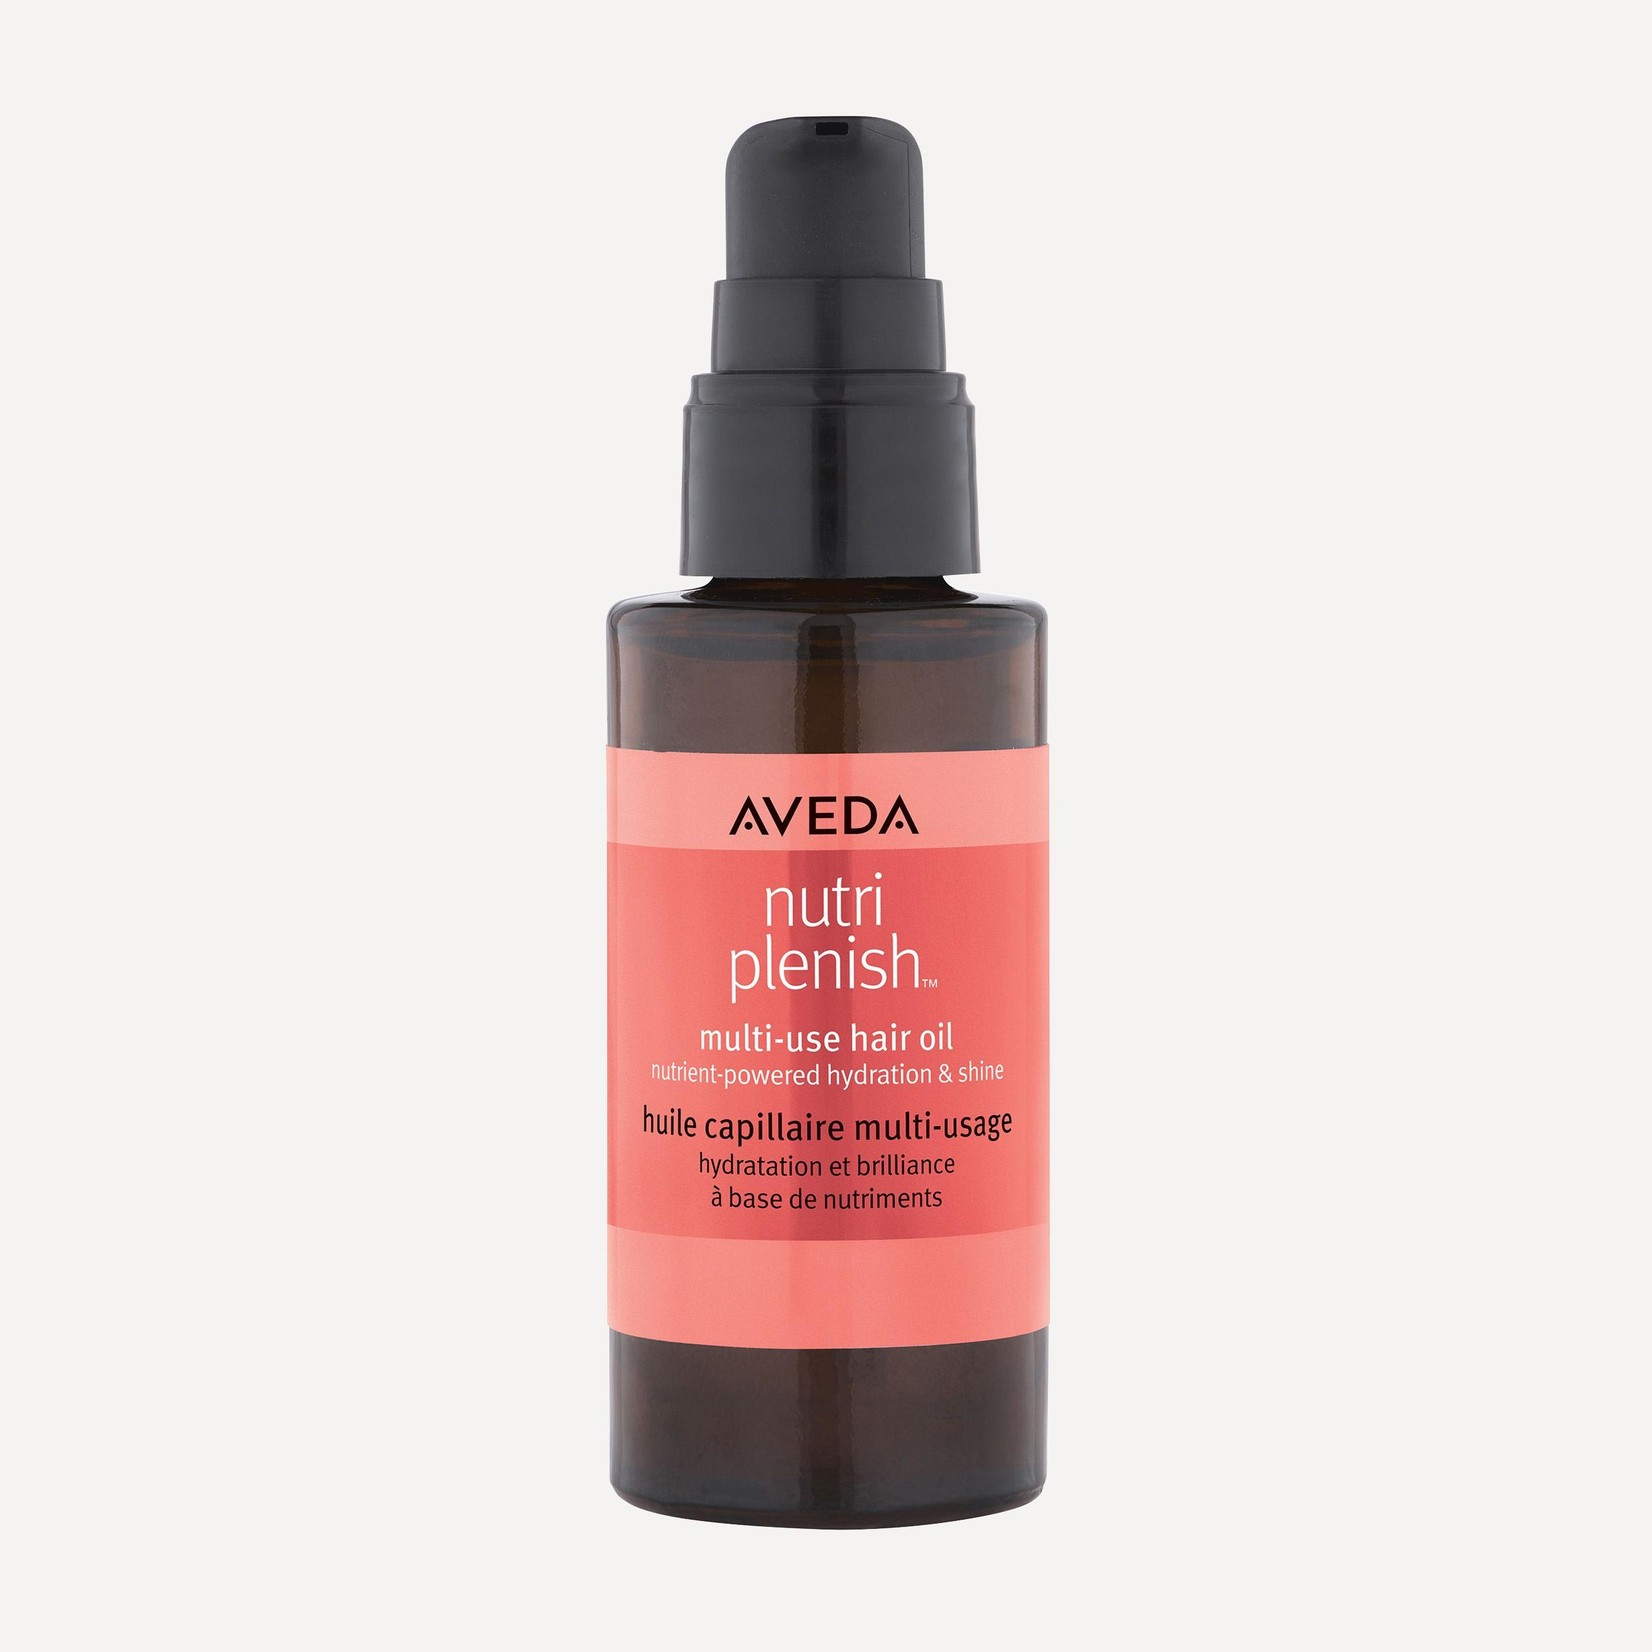 AVEDA Nutriplenish™ Multi-use Hair Oil